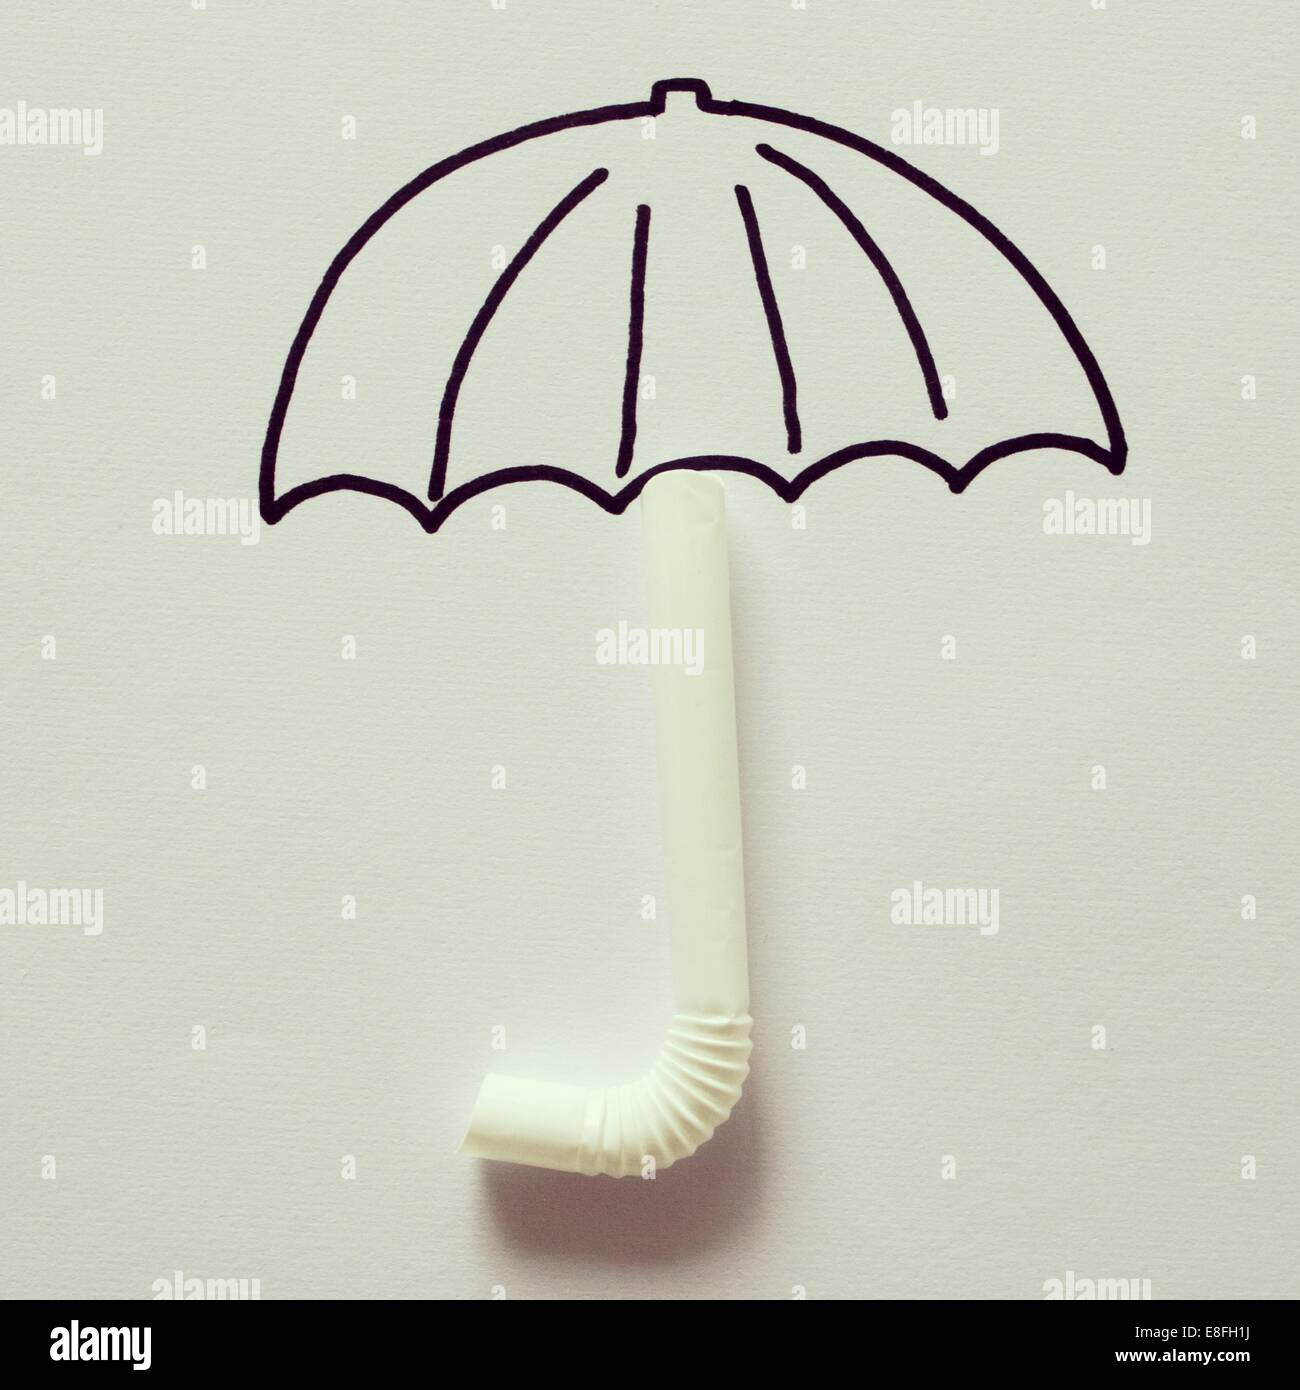 Conceptual umbrella - Stock Image